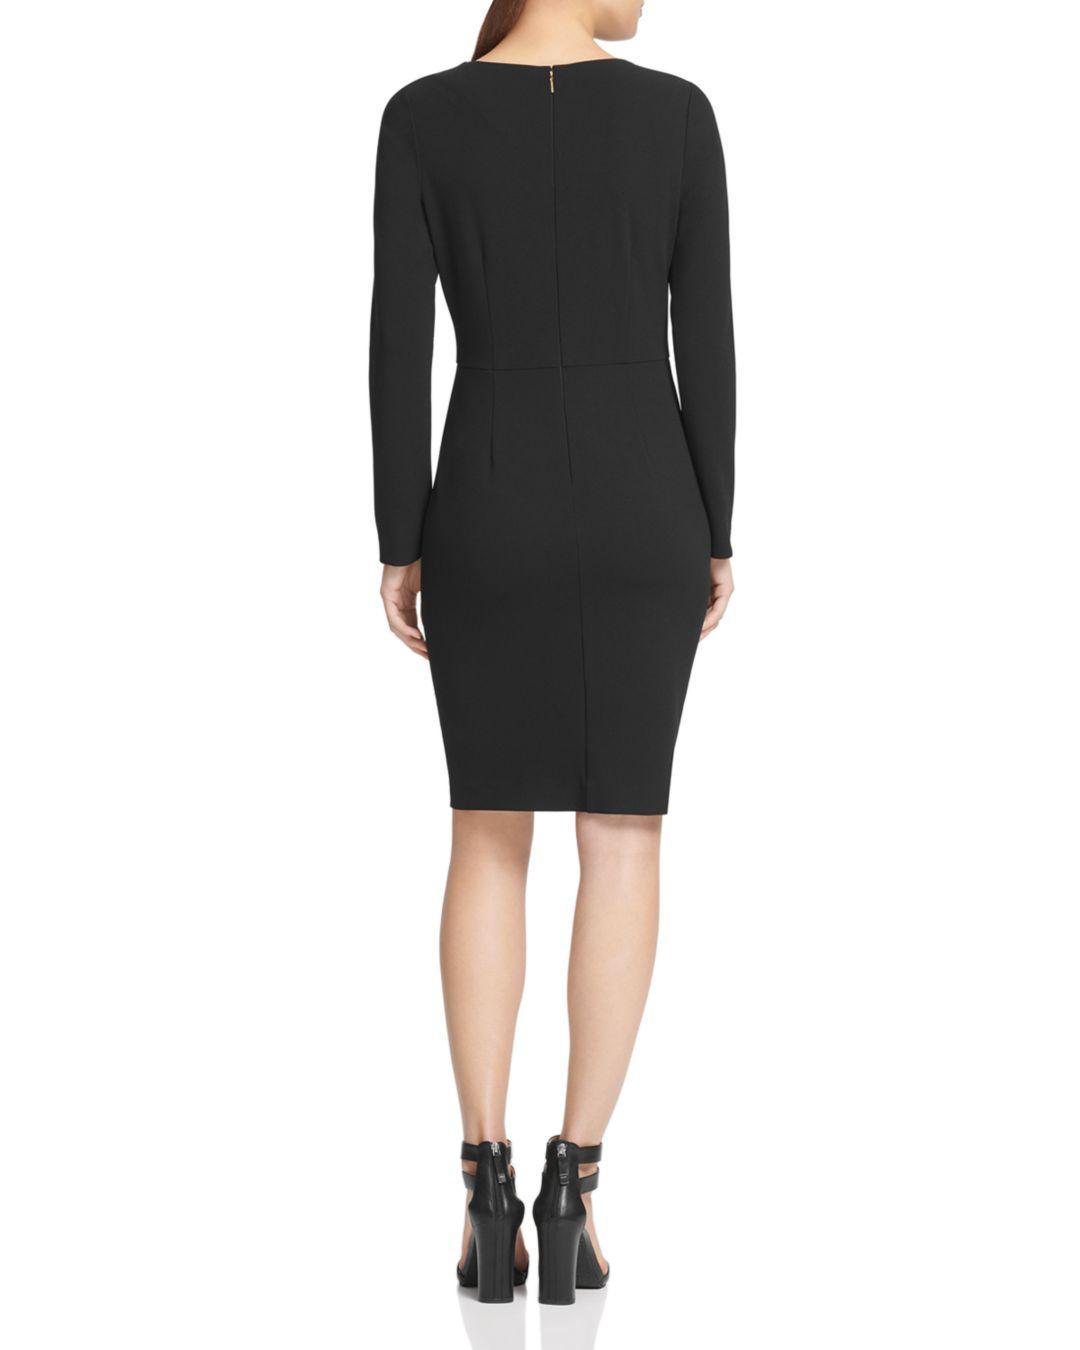 7c418a968cf2e Lyst - Donna Karan Twist-front Scuba-crepe Dress in Black